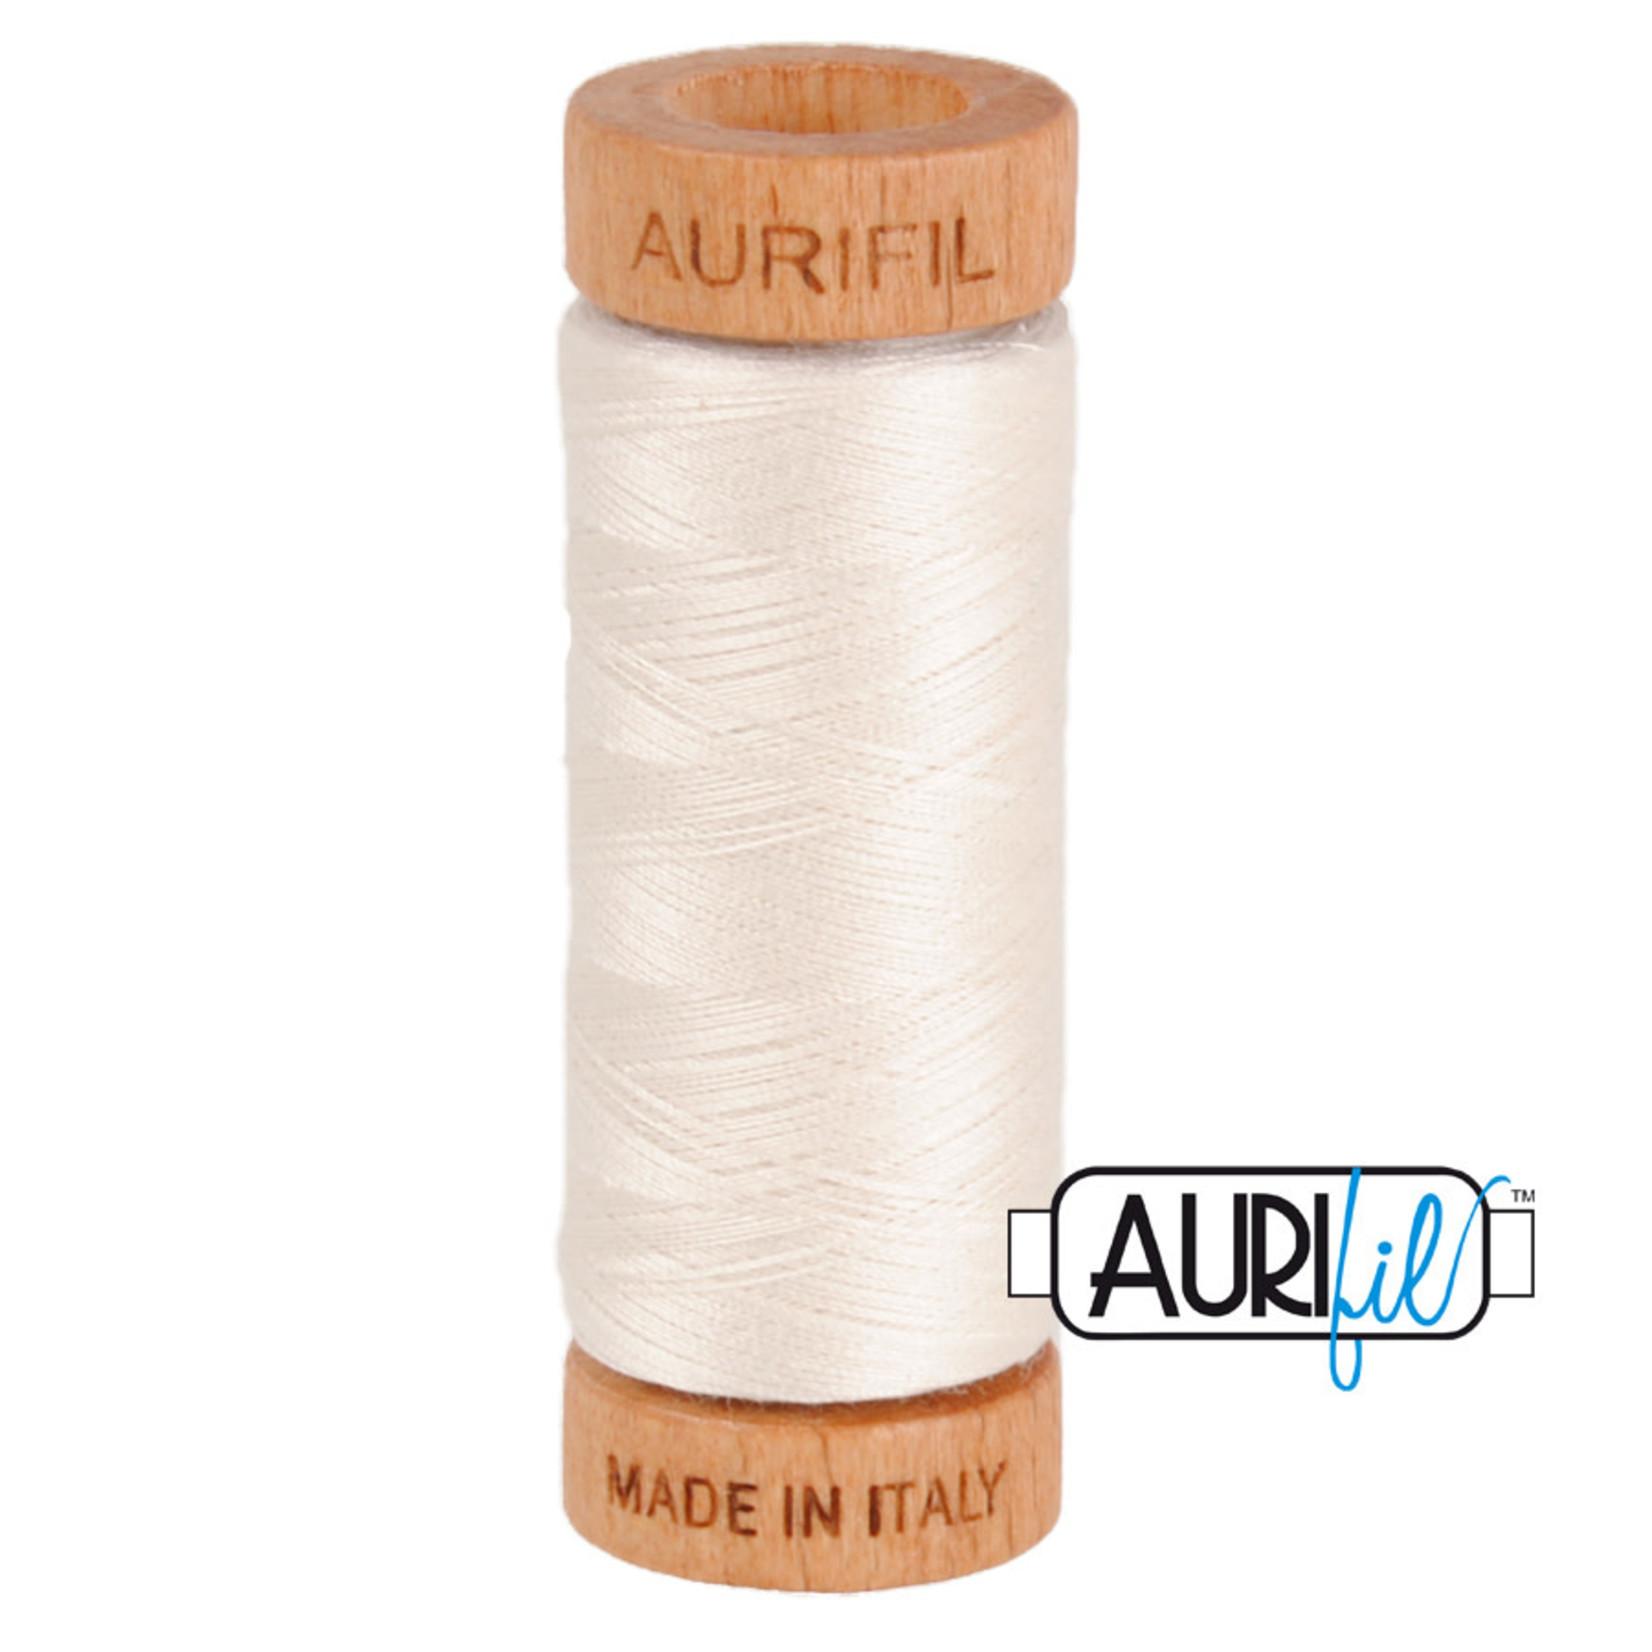 AURIFIL AURIFIL 80 WT FLOSS MUSLIN 2311